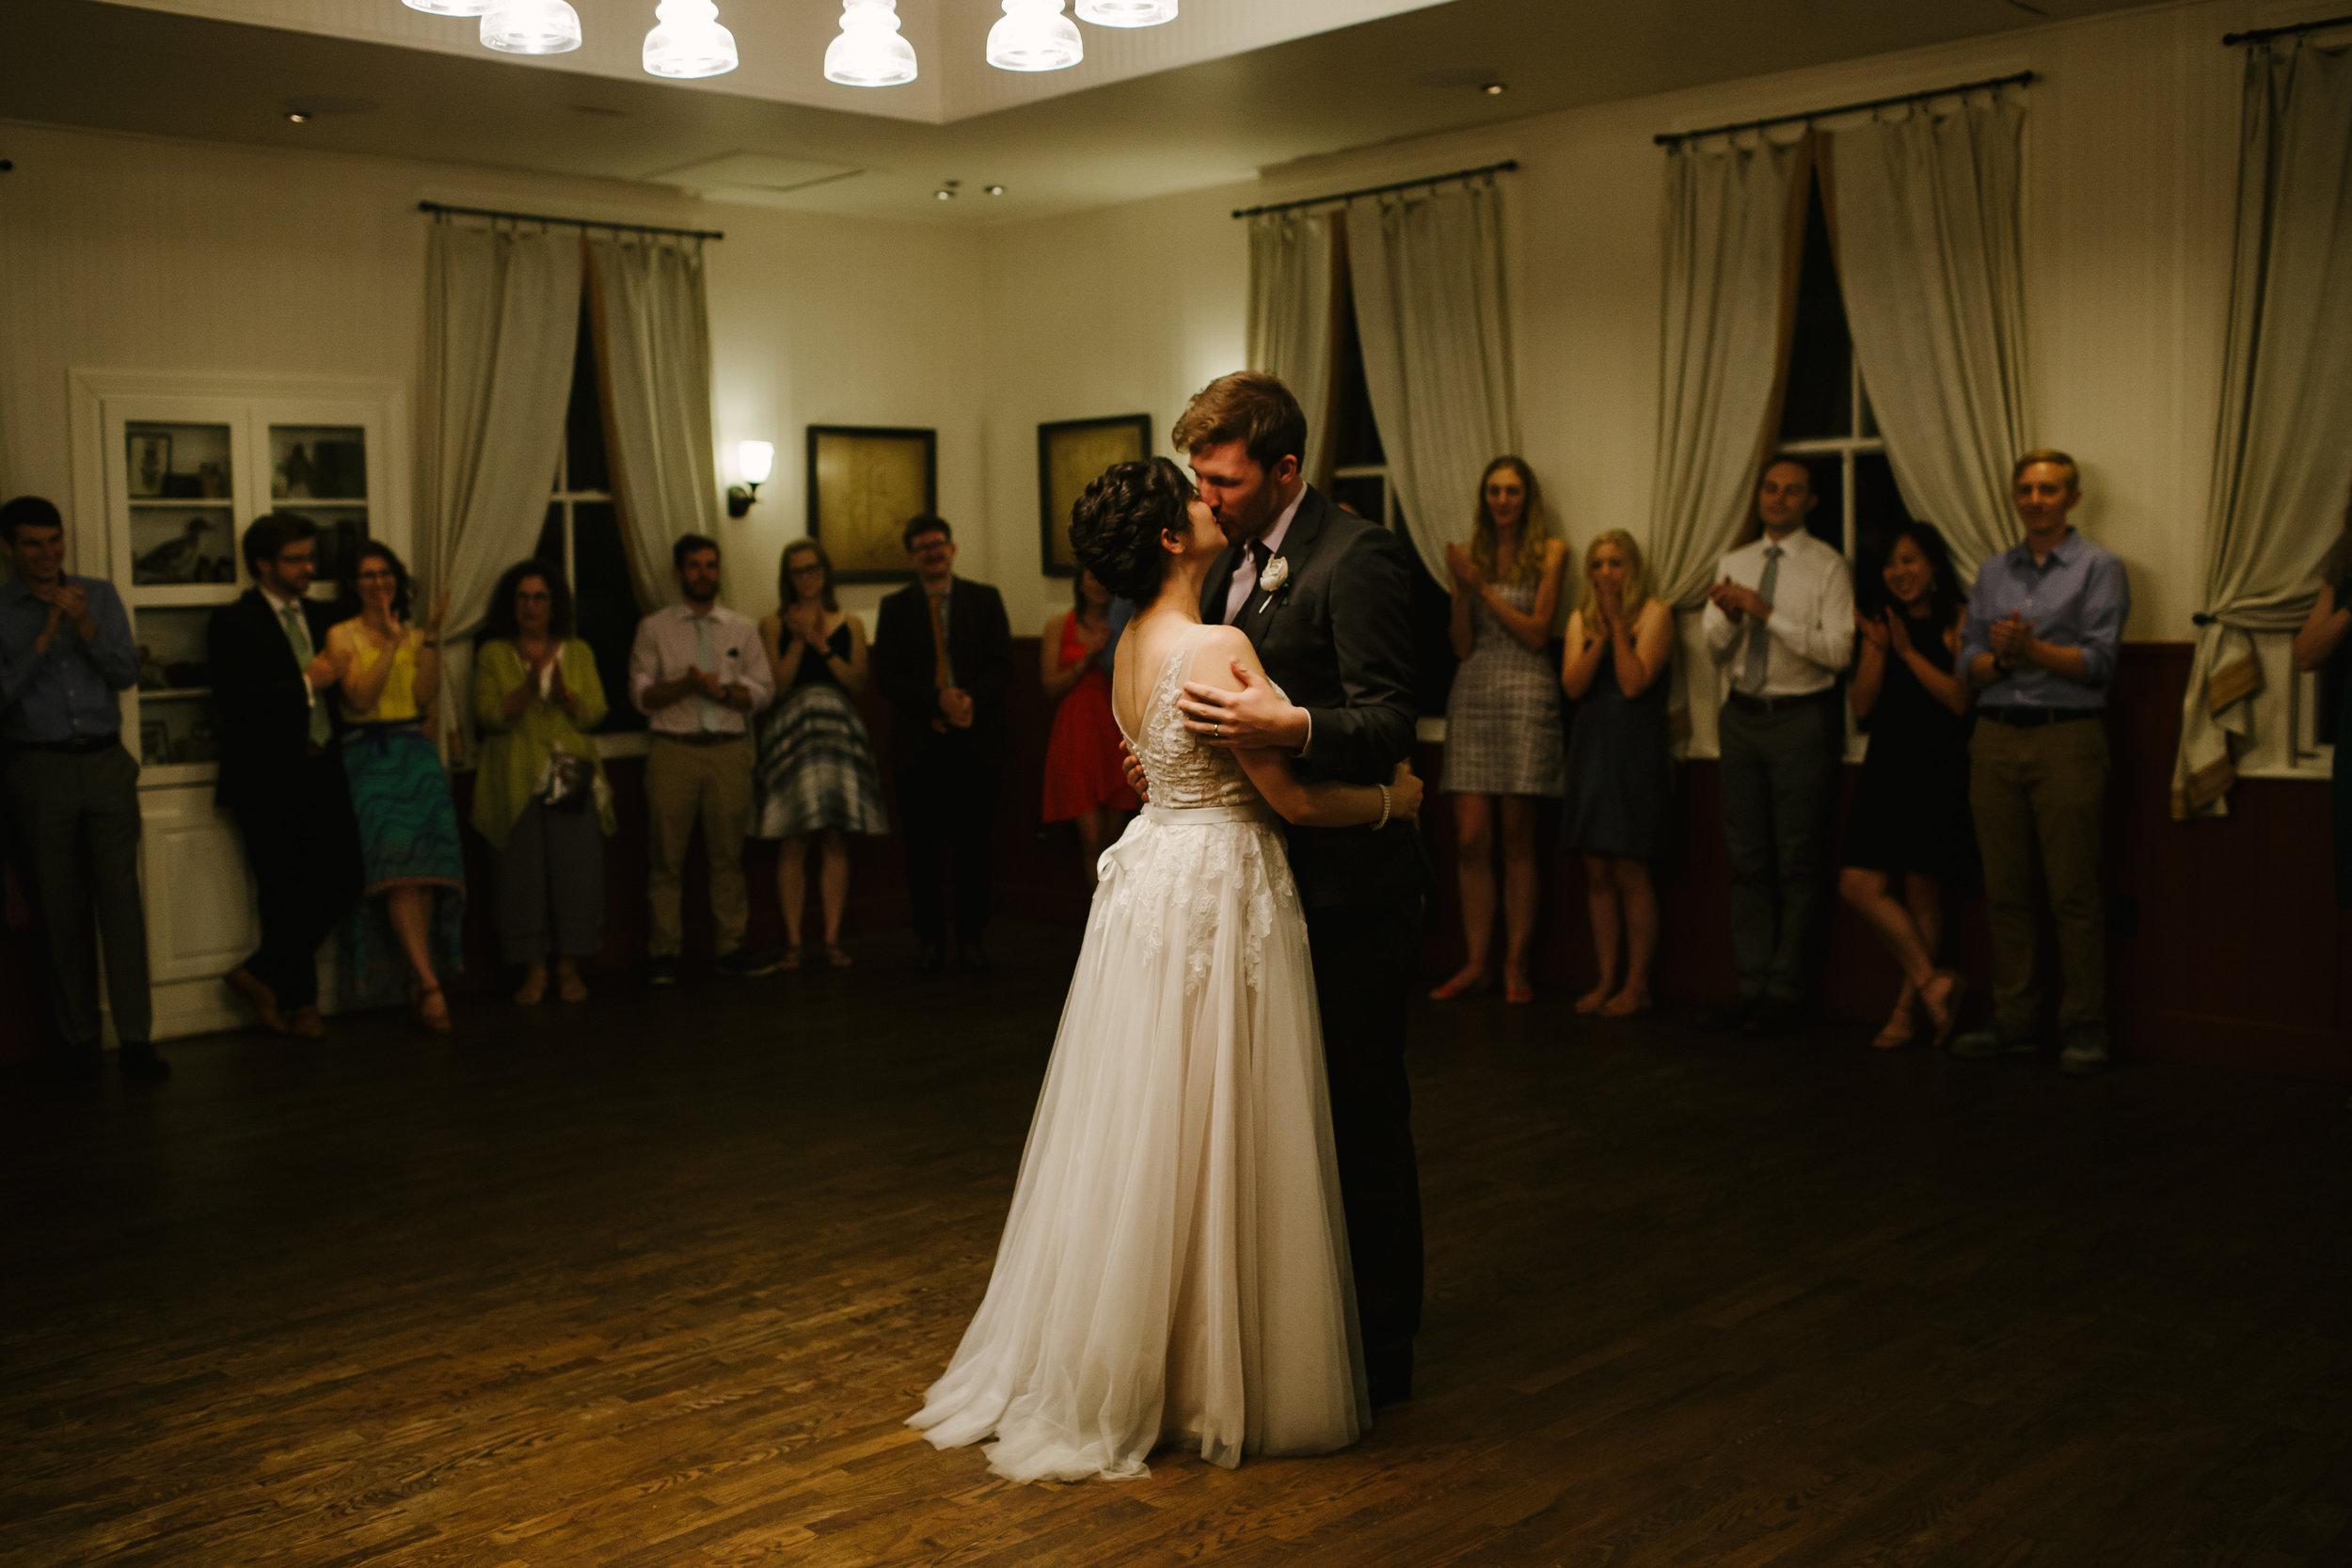 Boulder Bride and Groom First Dance